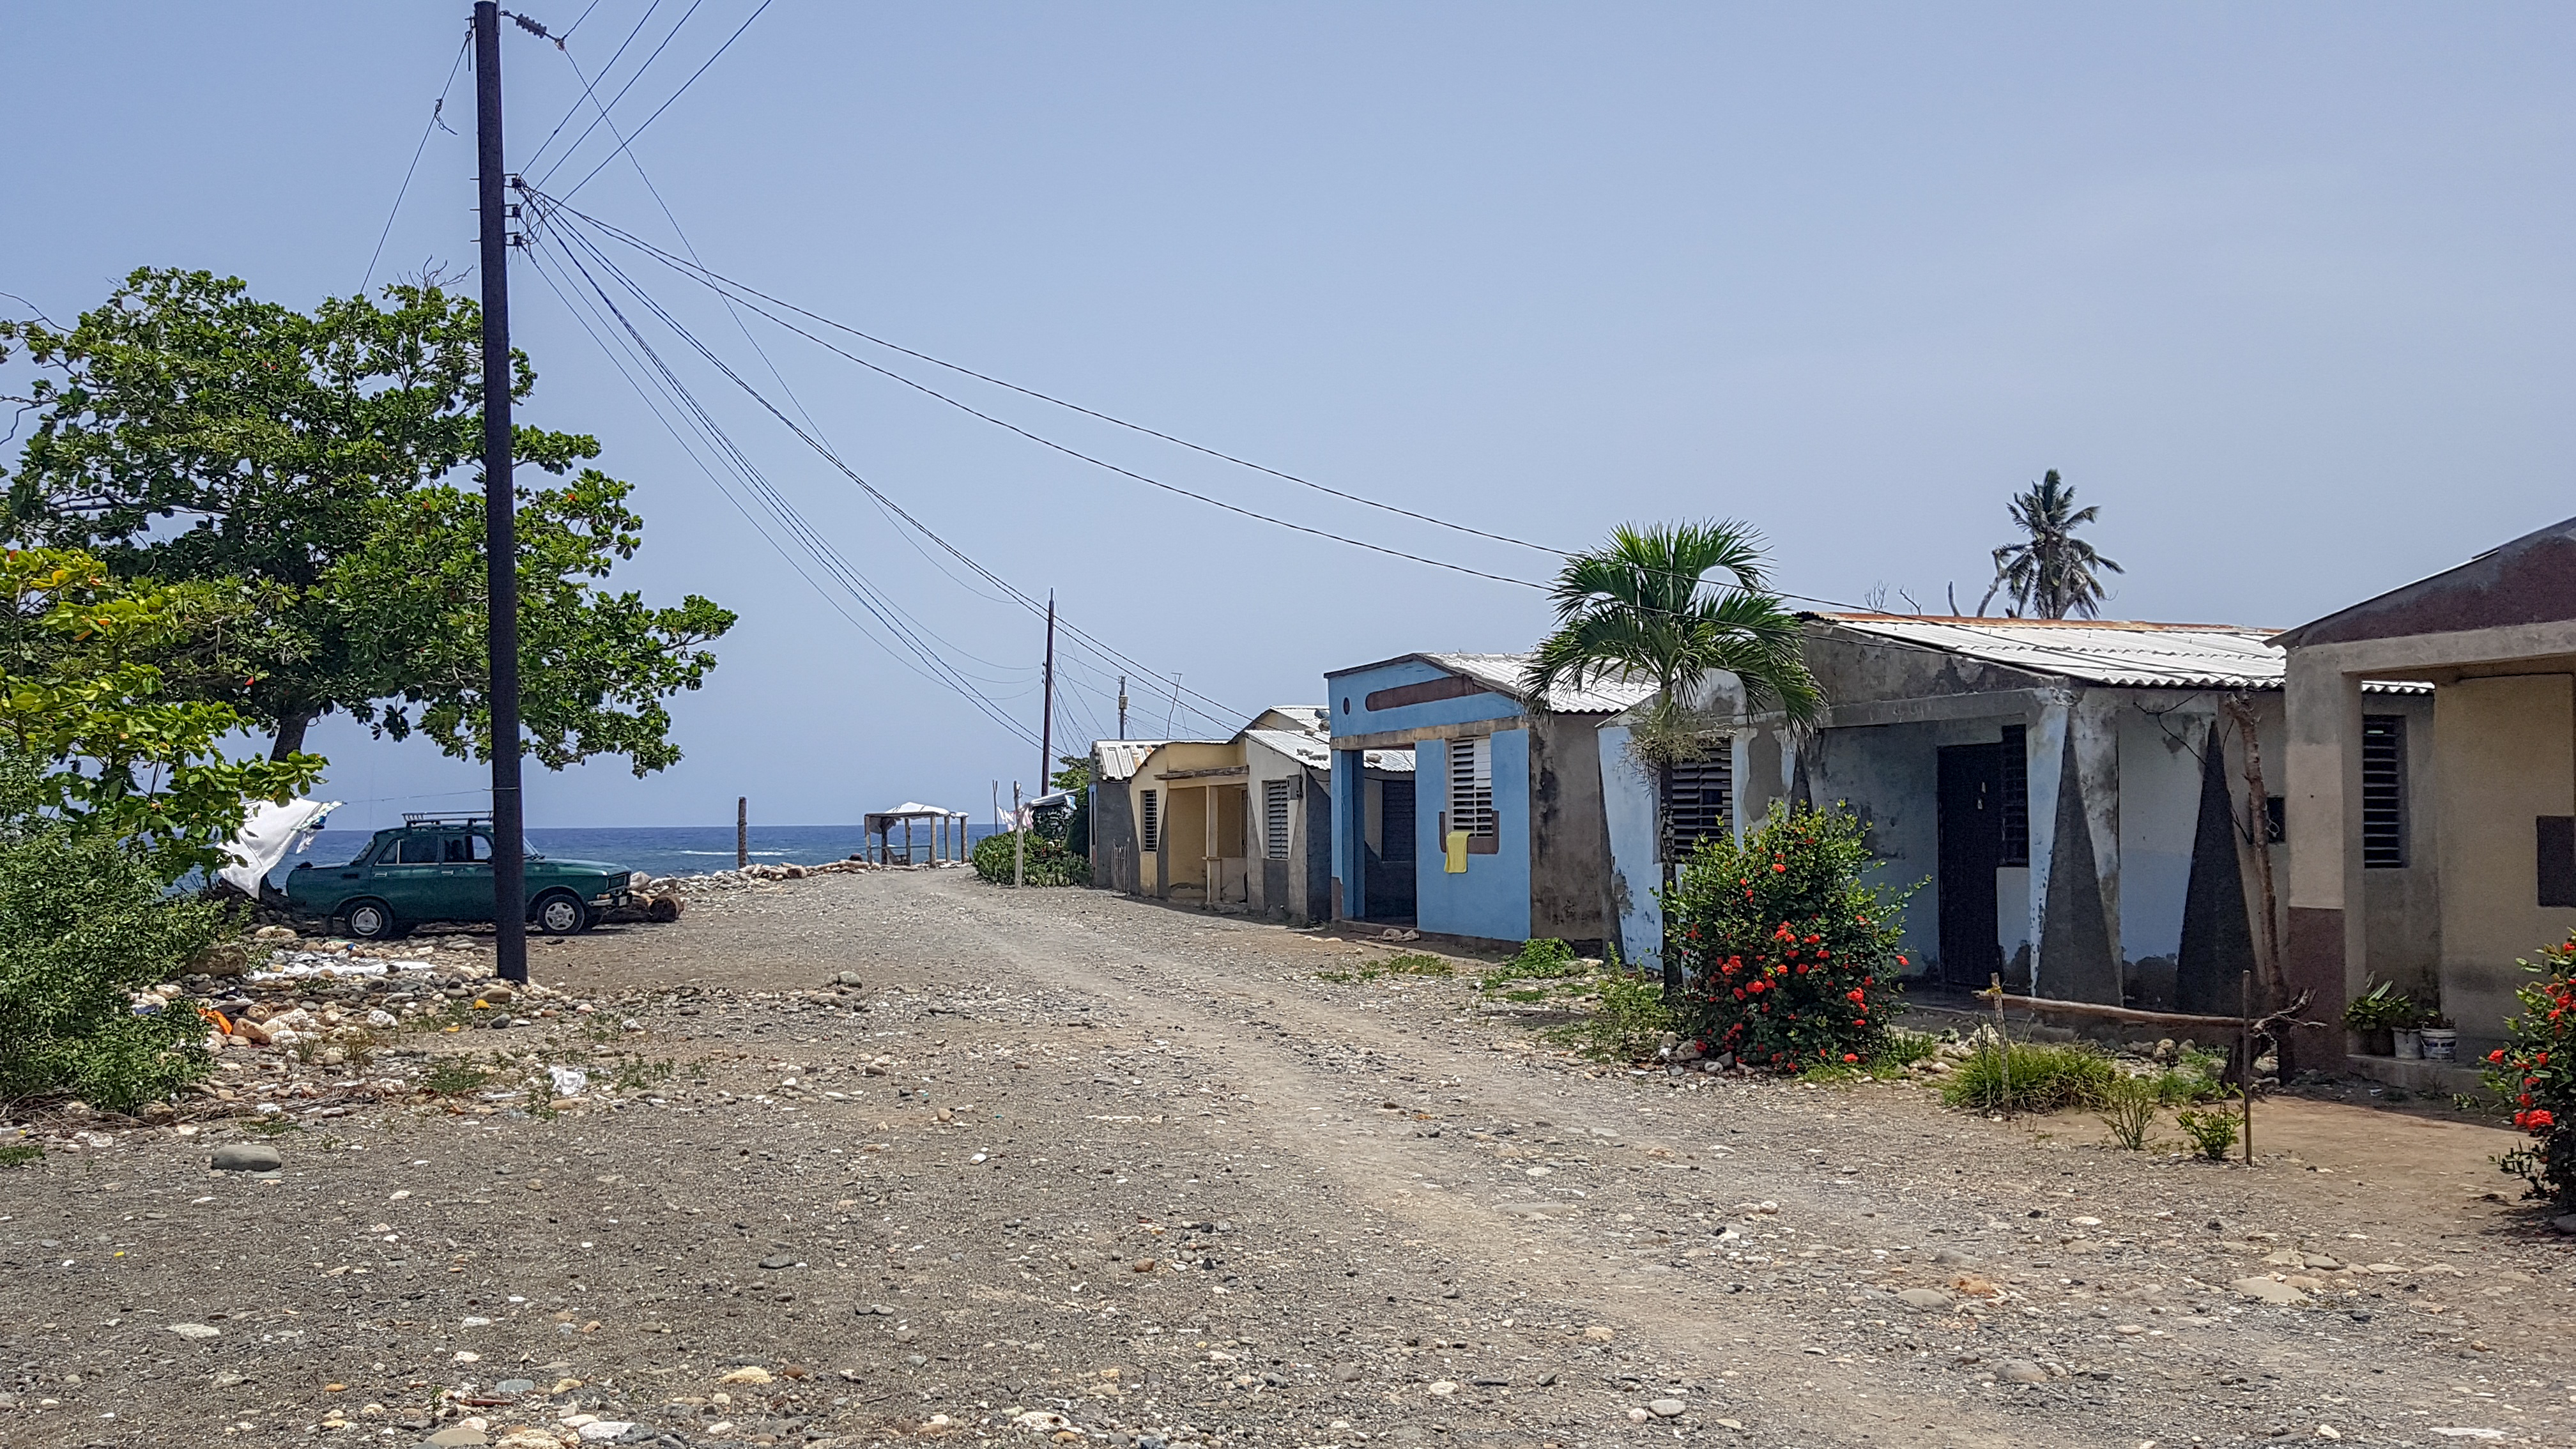 Boca de Yumuri, Baracoa, Cuba